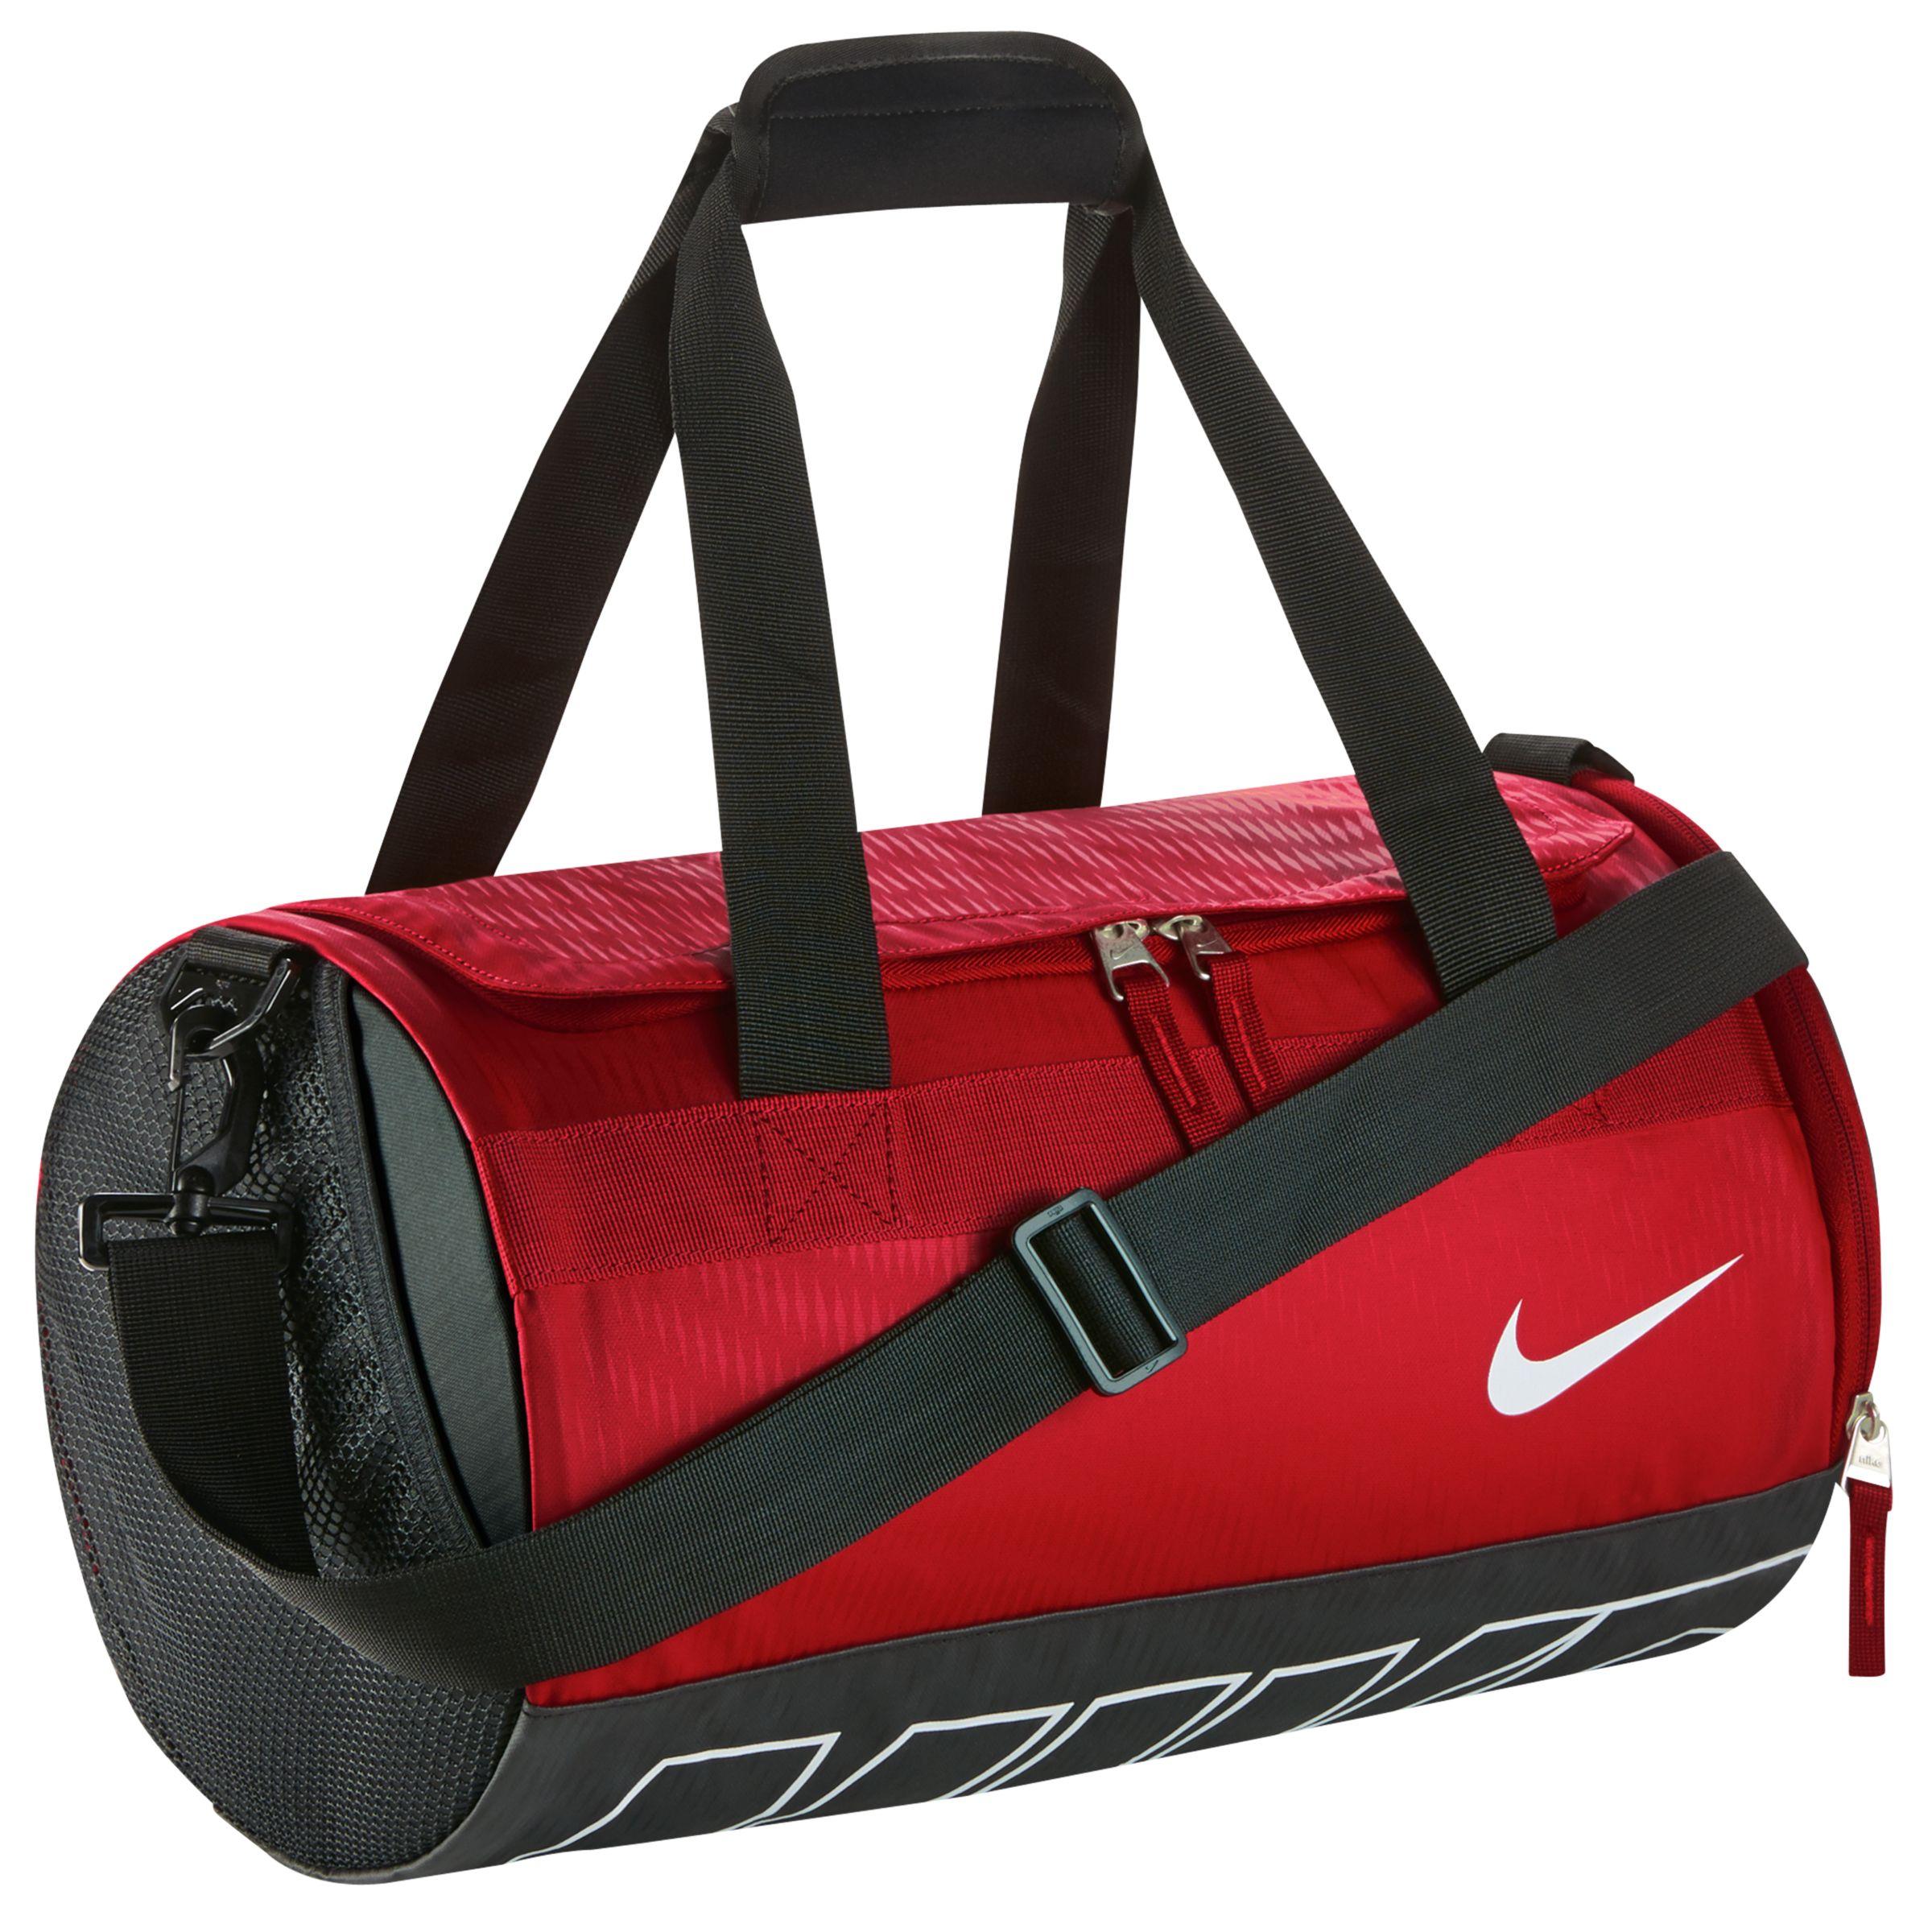 8d1796bb29 Nike Alpha Adapt Drum Mini Duffel Bag at John Lewis   Partners